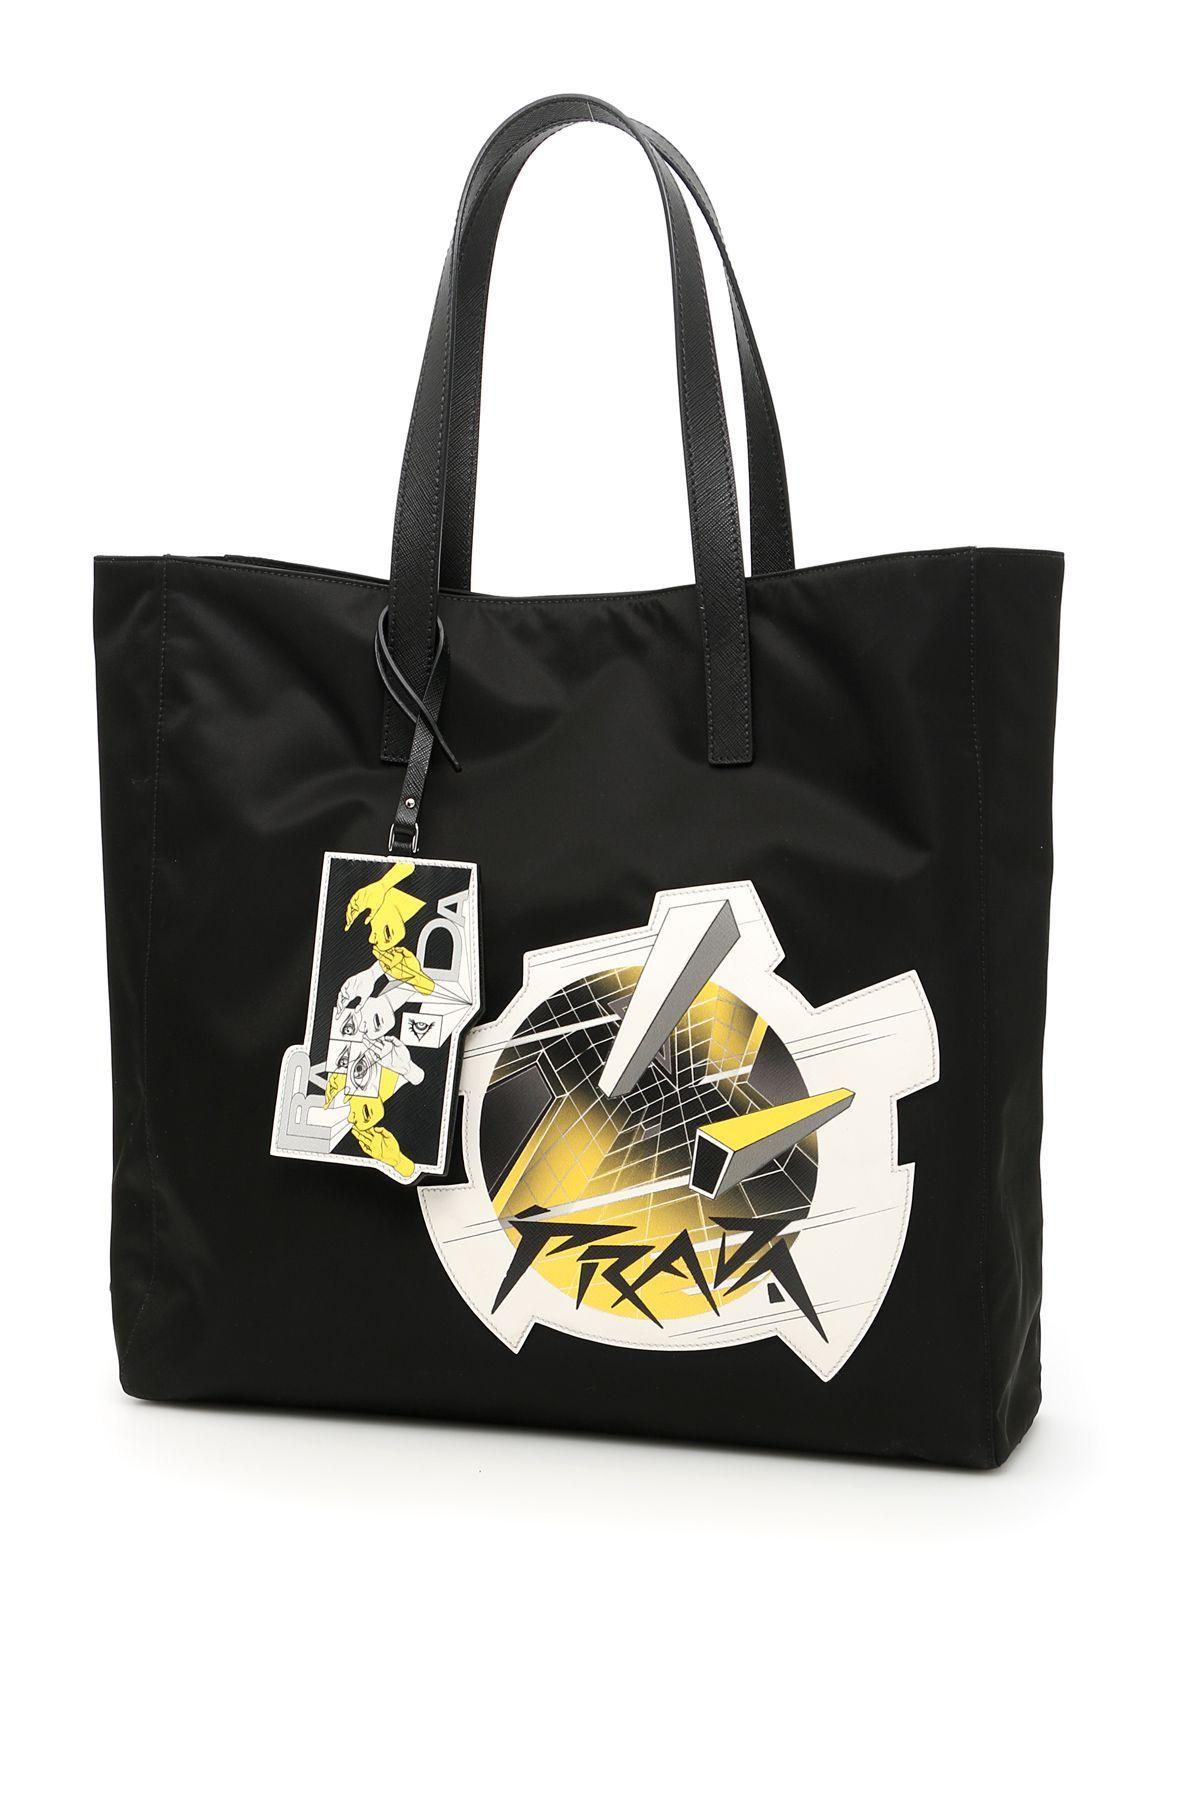 8a29d06c448 PRADA NYLON SHOPPING BAG WITH LOGO PATCH.  prada  bags  tote  leather   lining  denim  hand bags  nylon